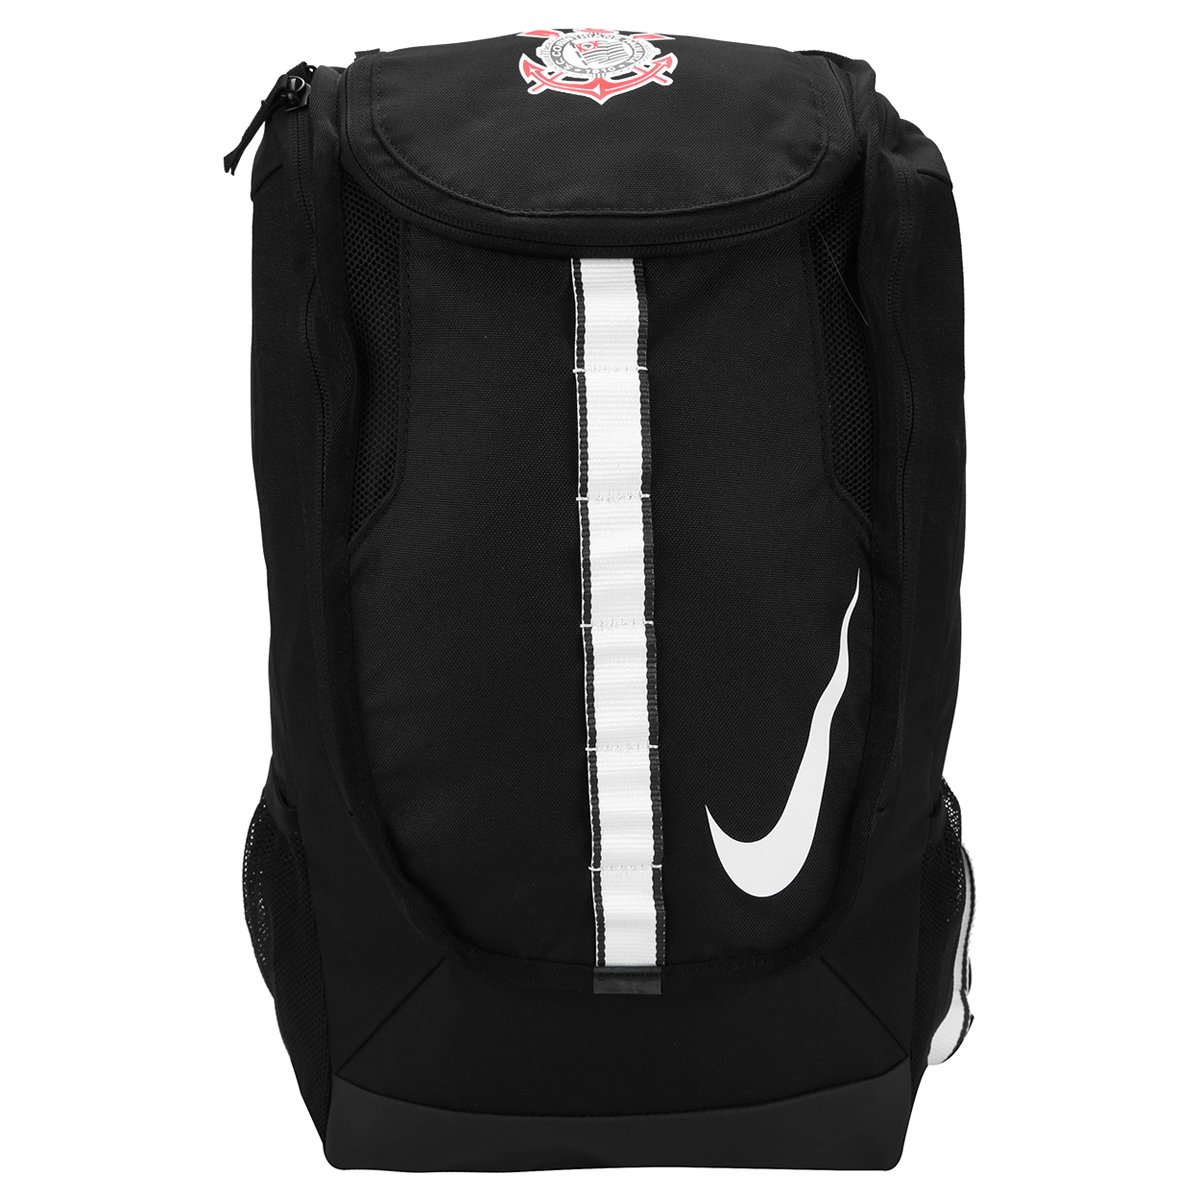 572ea8b33 Mochila Nike Corinthians Allegiance Shield   Netshoes